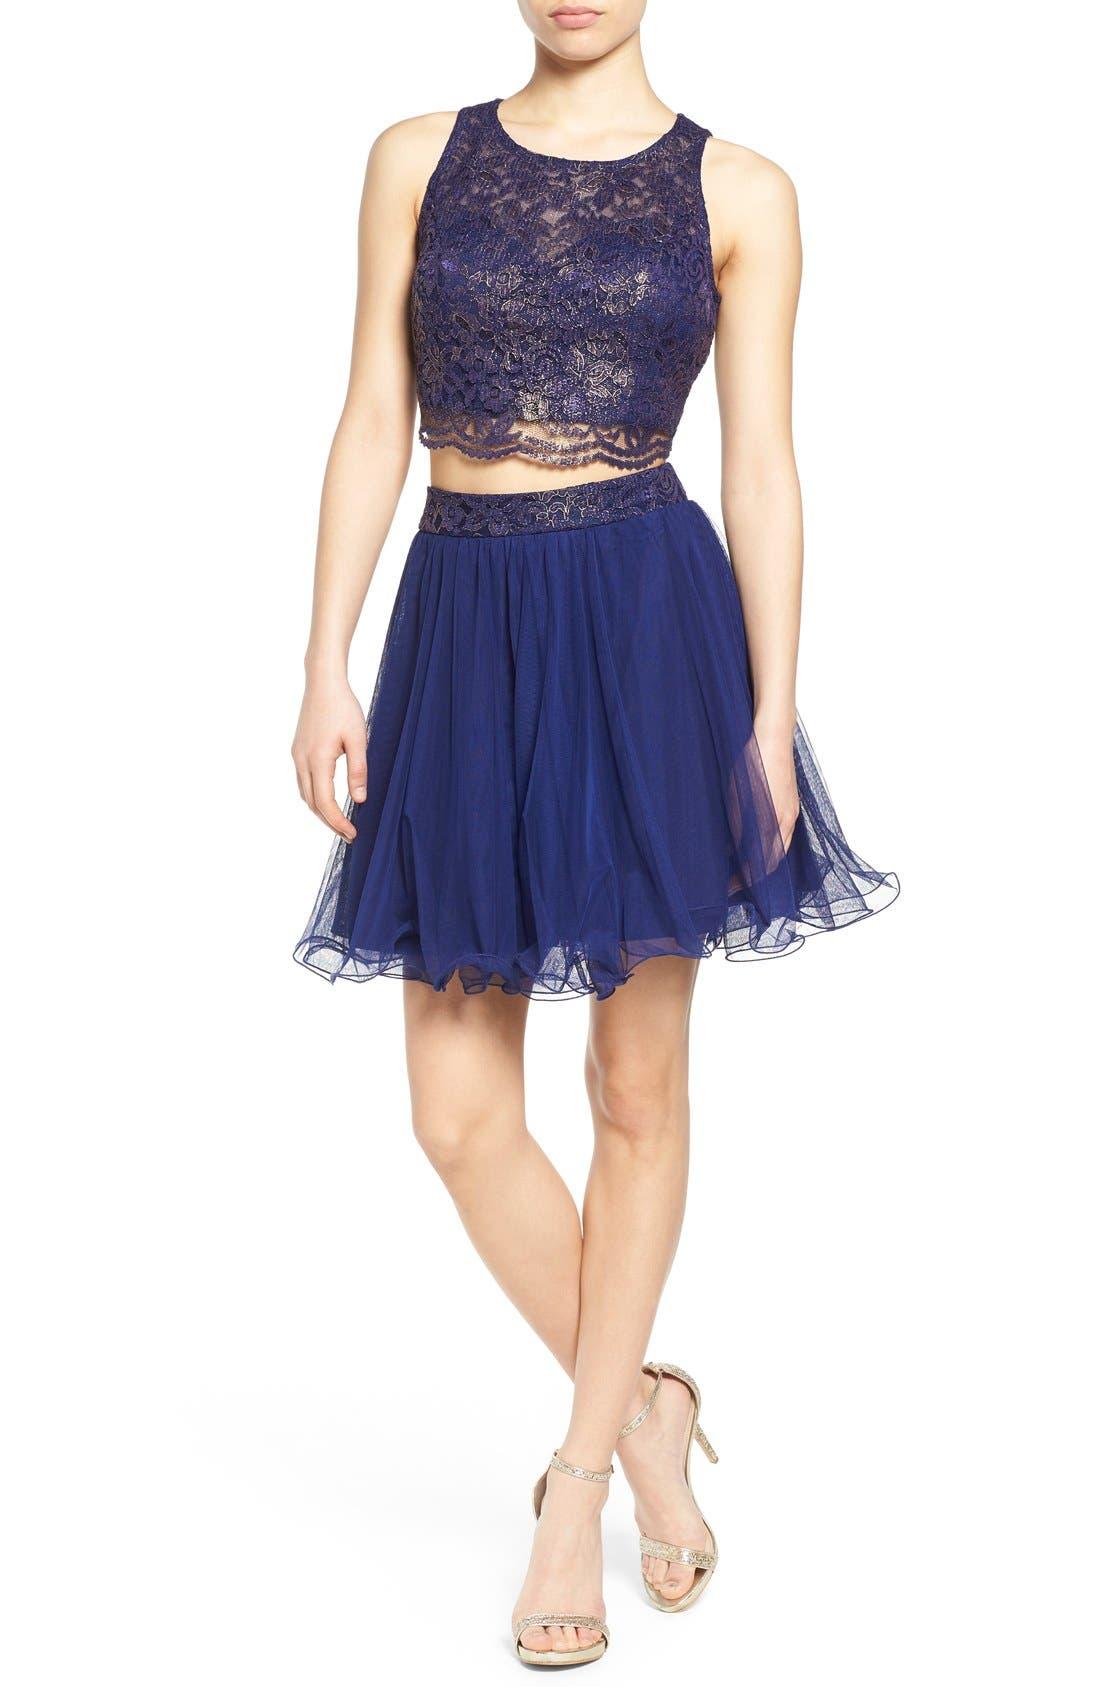 Alternate Image 1 Selected - Secret Charm 'Gina' Metallic Lace Two-Piece Skater Dress